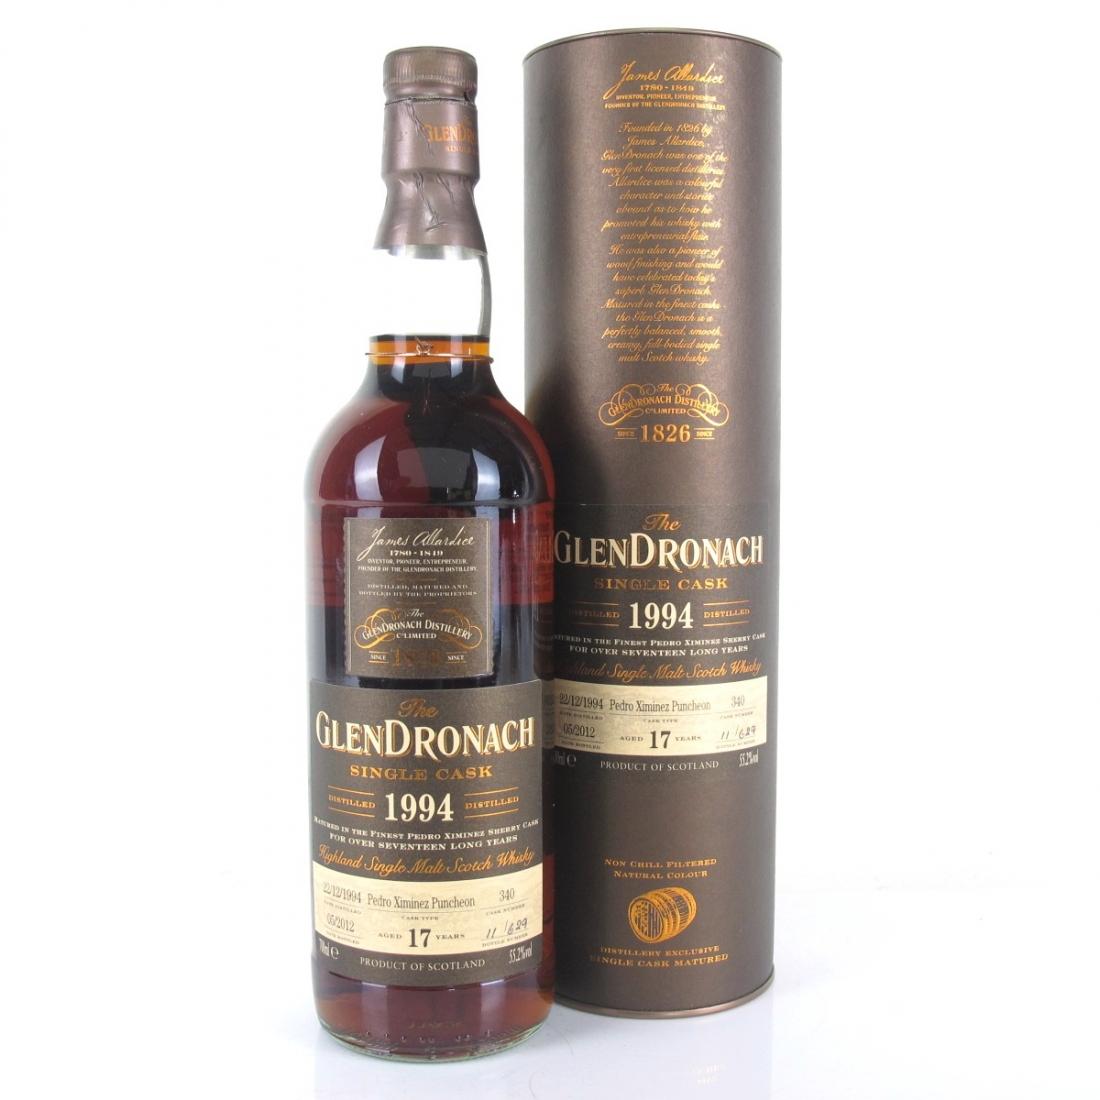 Glendronach 1994 Single Cask 17 Year Old #340